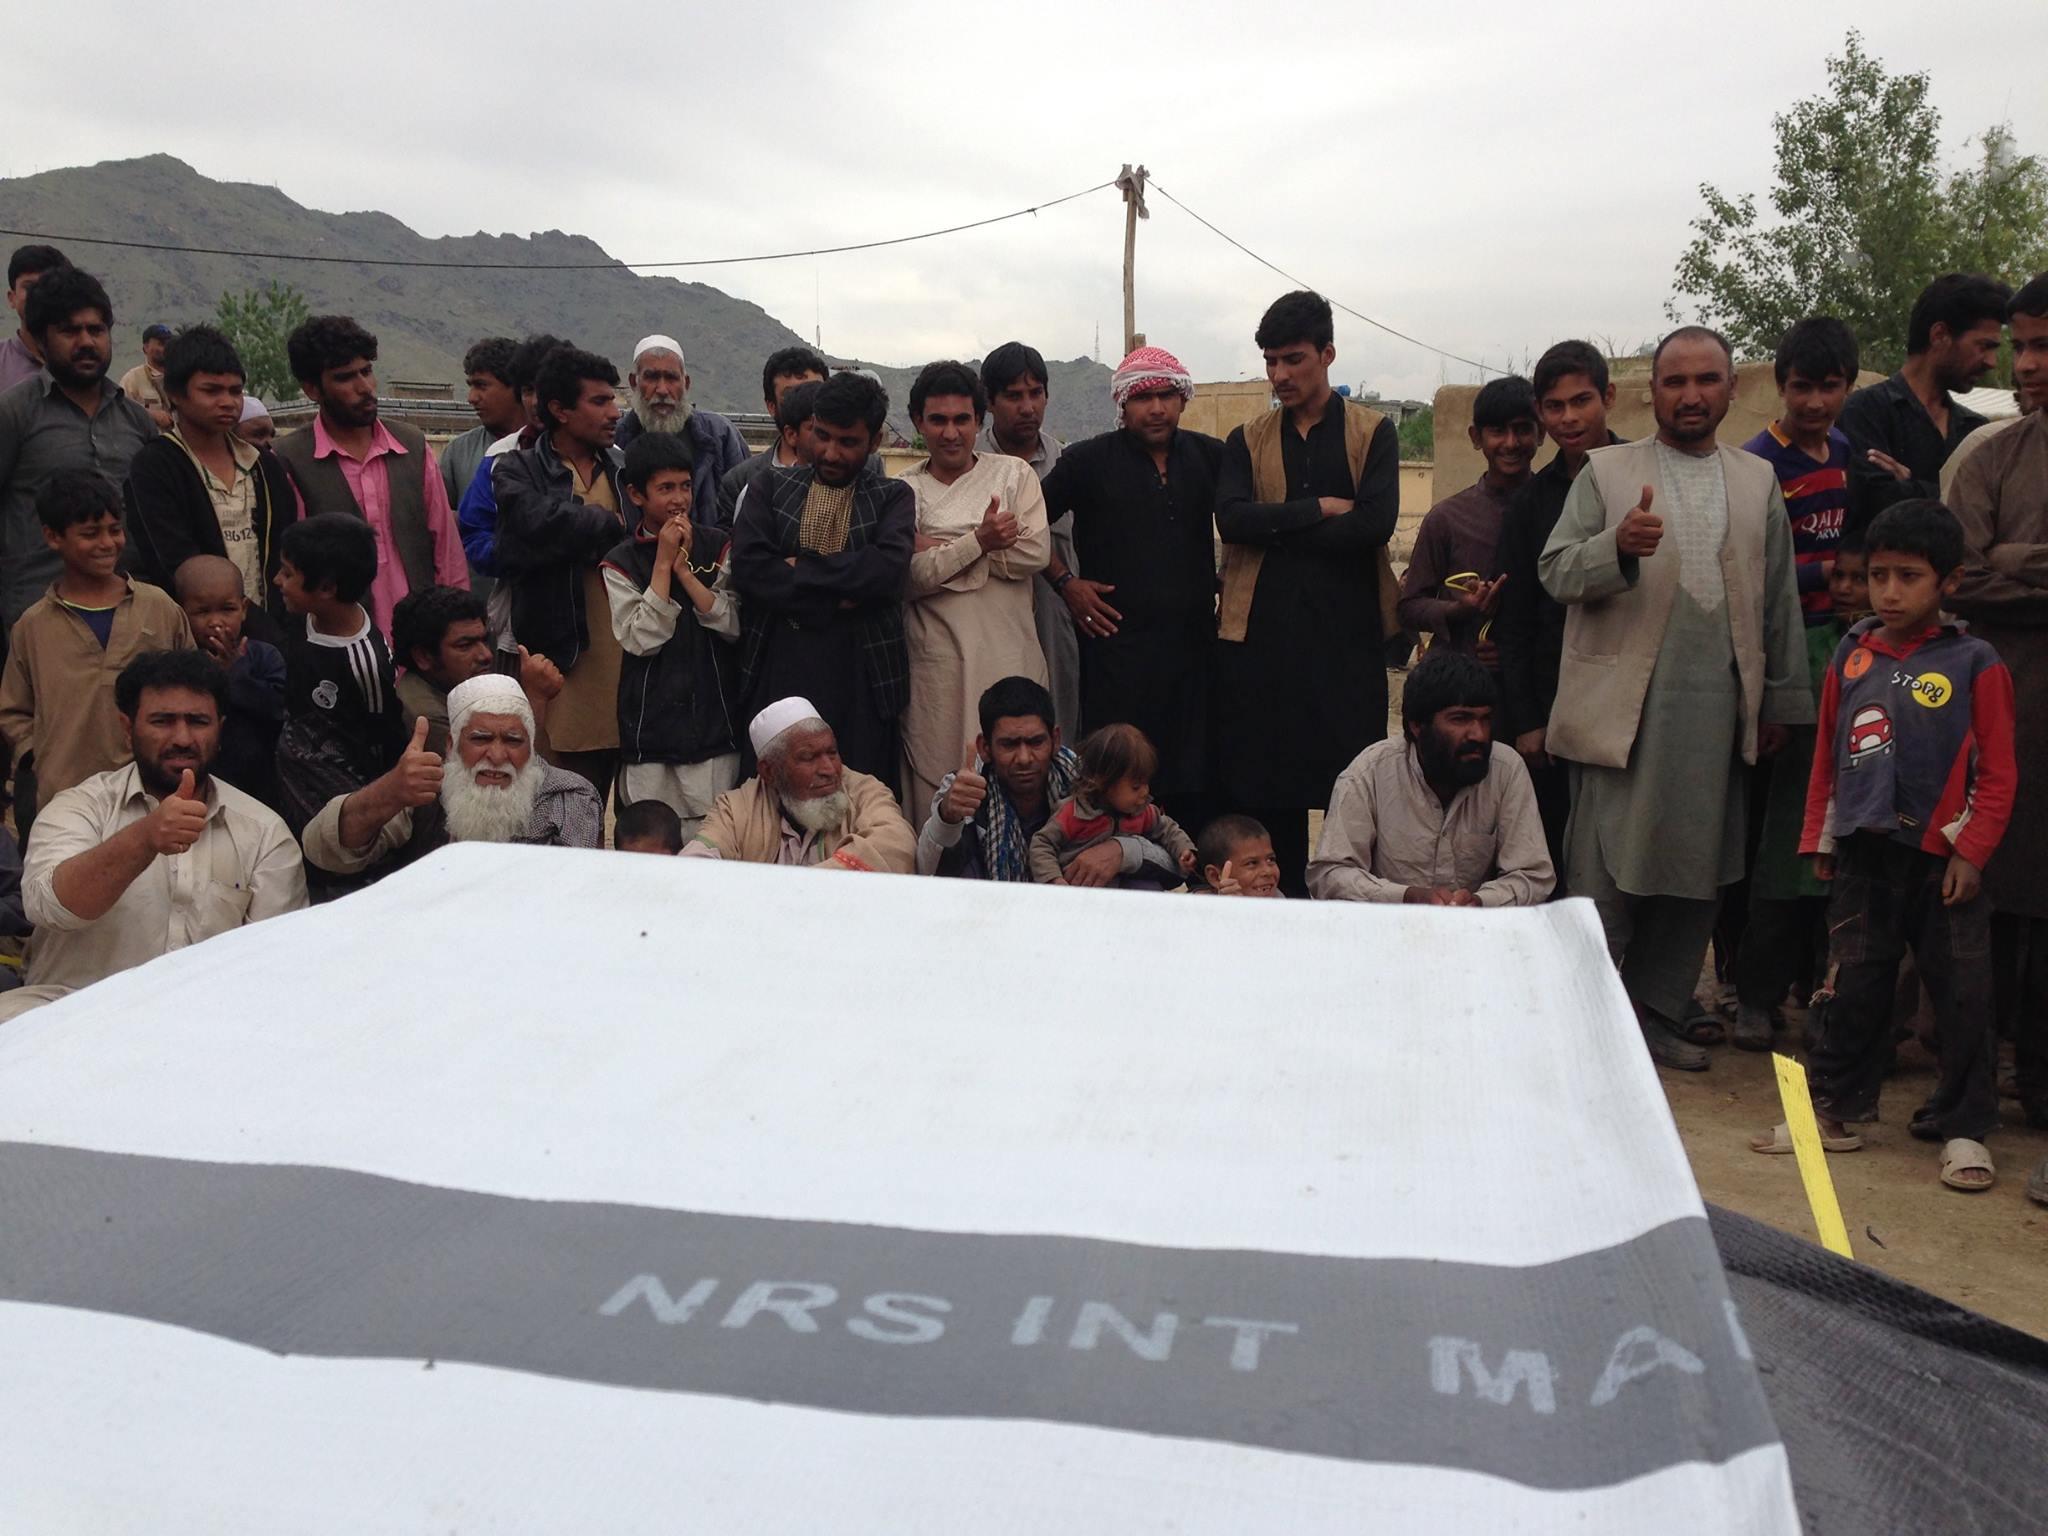 NRS Relief giving tarpaulins in Afghanistan 2016